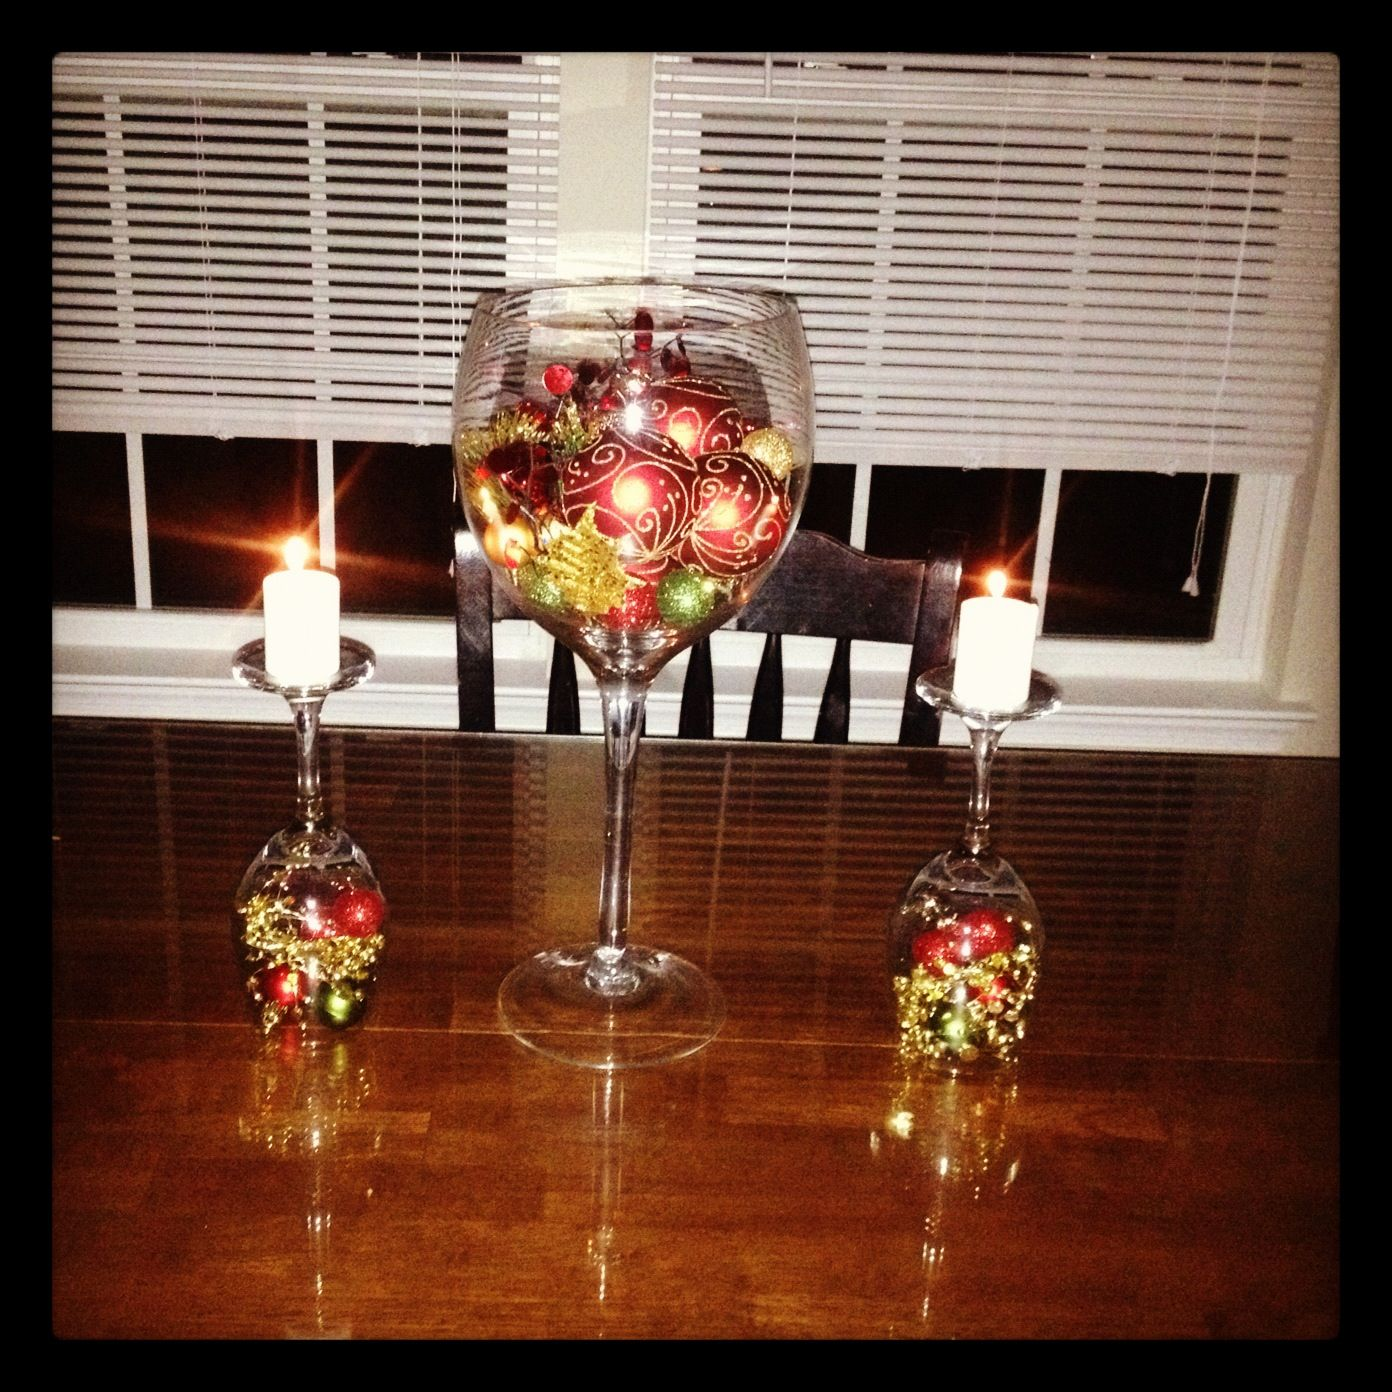 Wine Glass Center Piece To Stick With My Wine Theme Kitchen Wine Decor Kitchen Wine Theme Kitchen Wine Kitchen Ideas